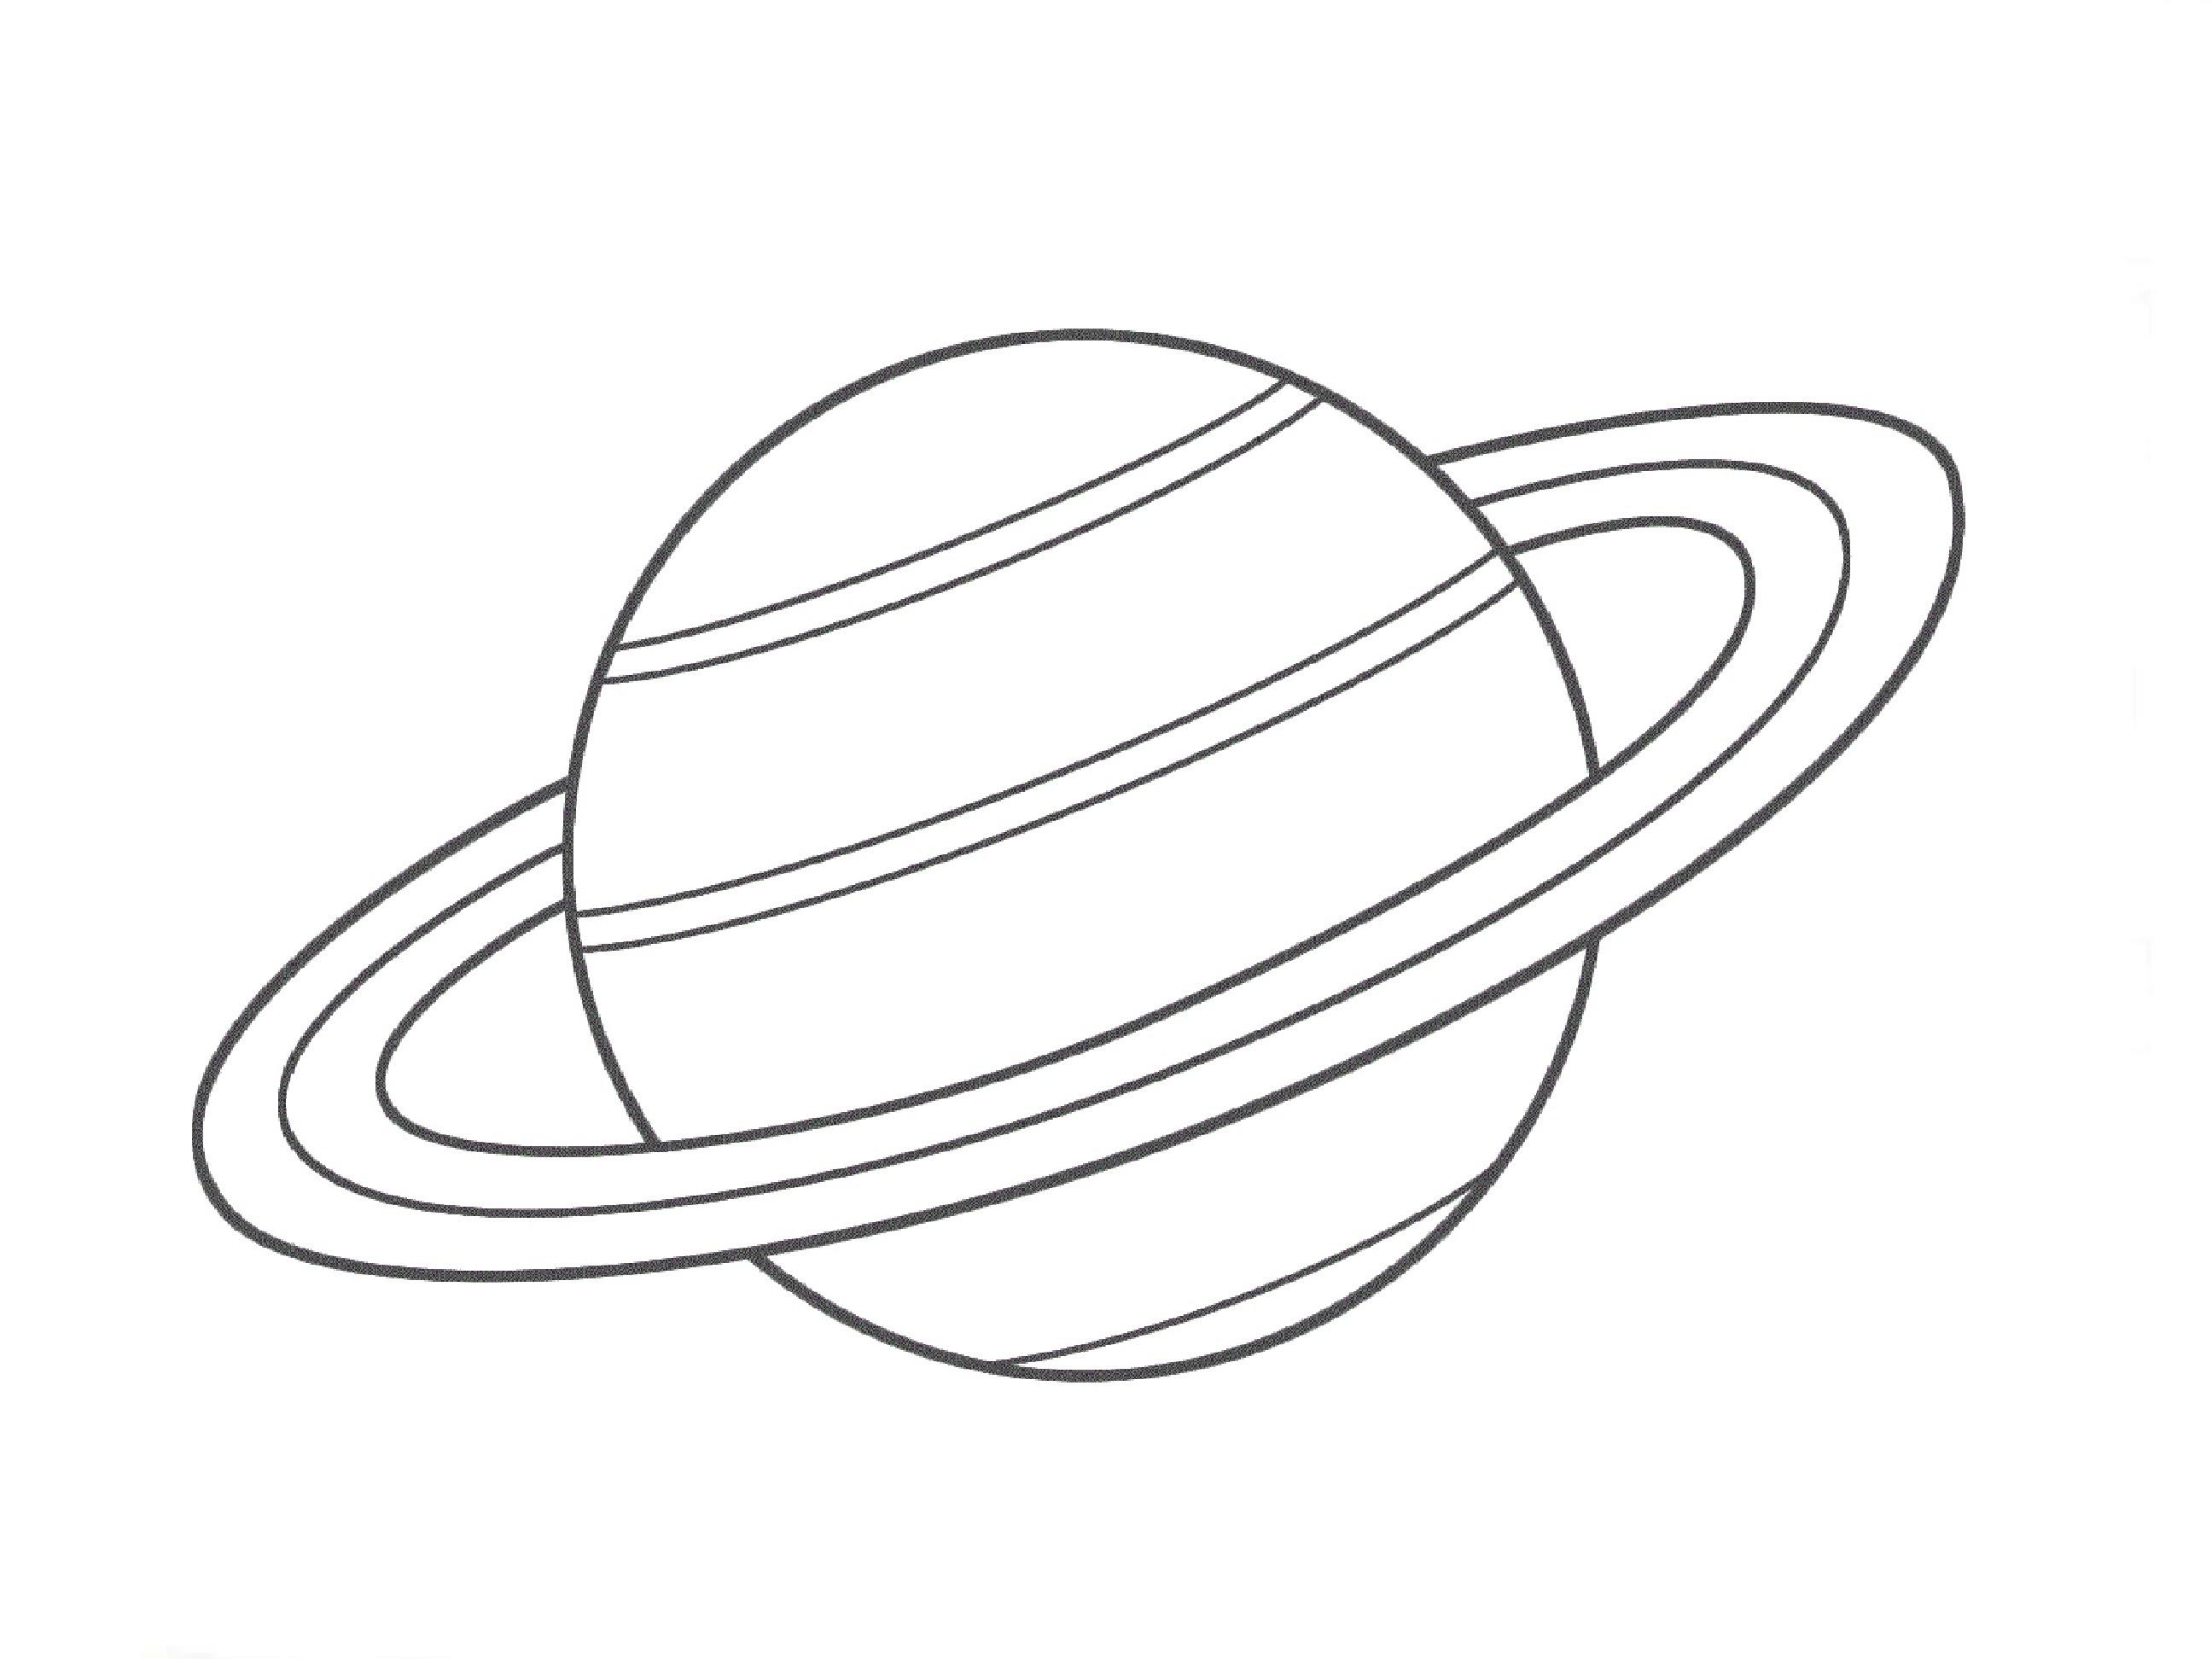 Planet Drawing At Getdrawings